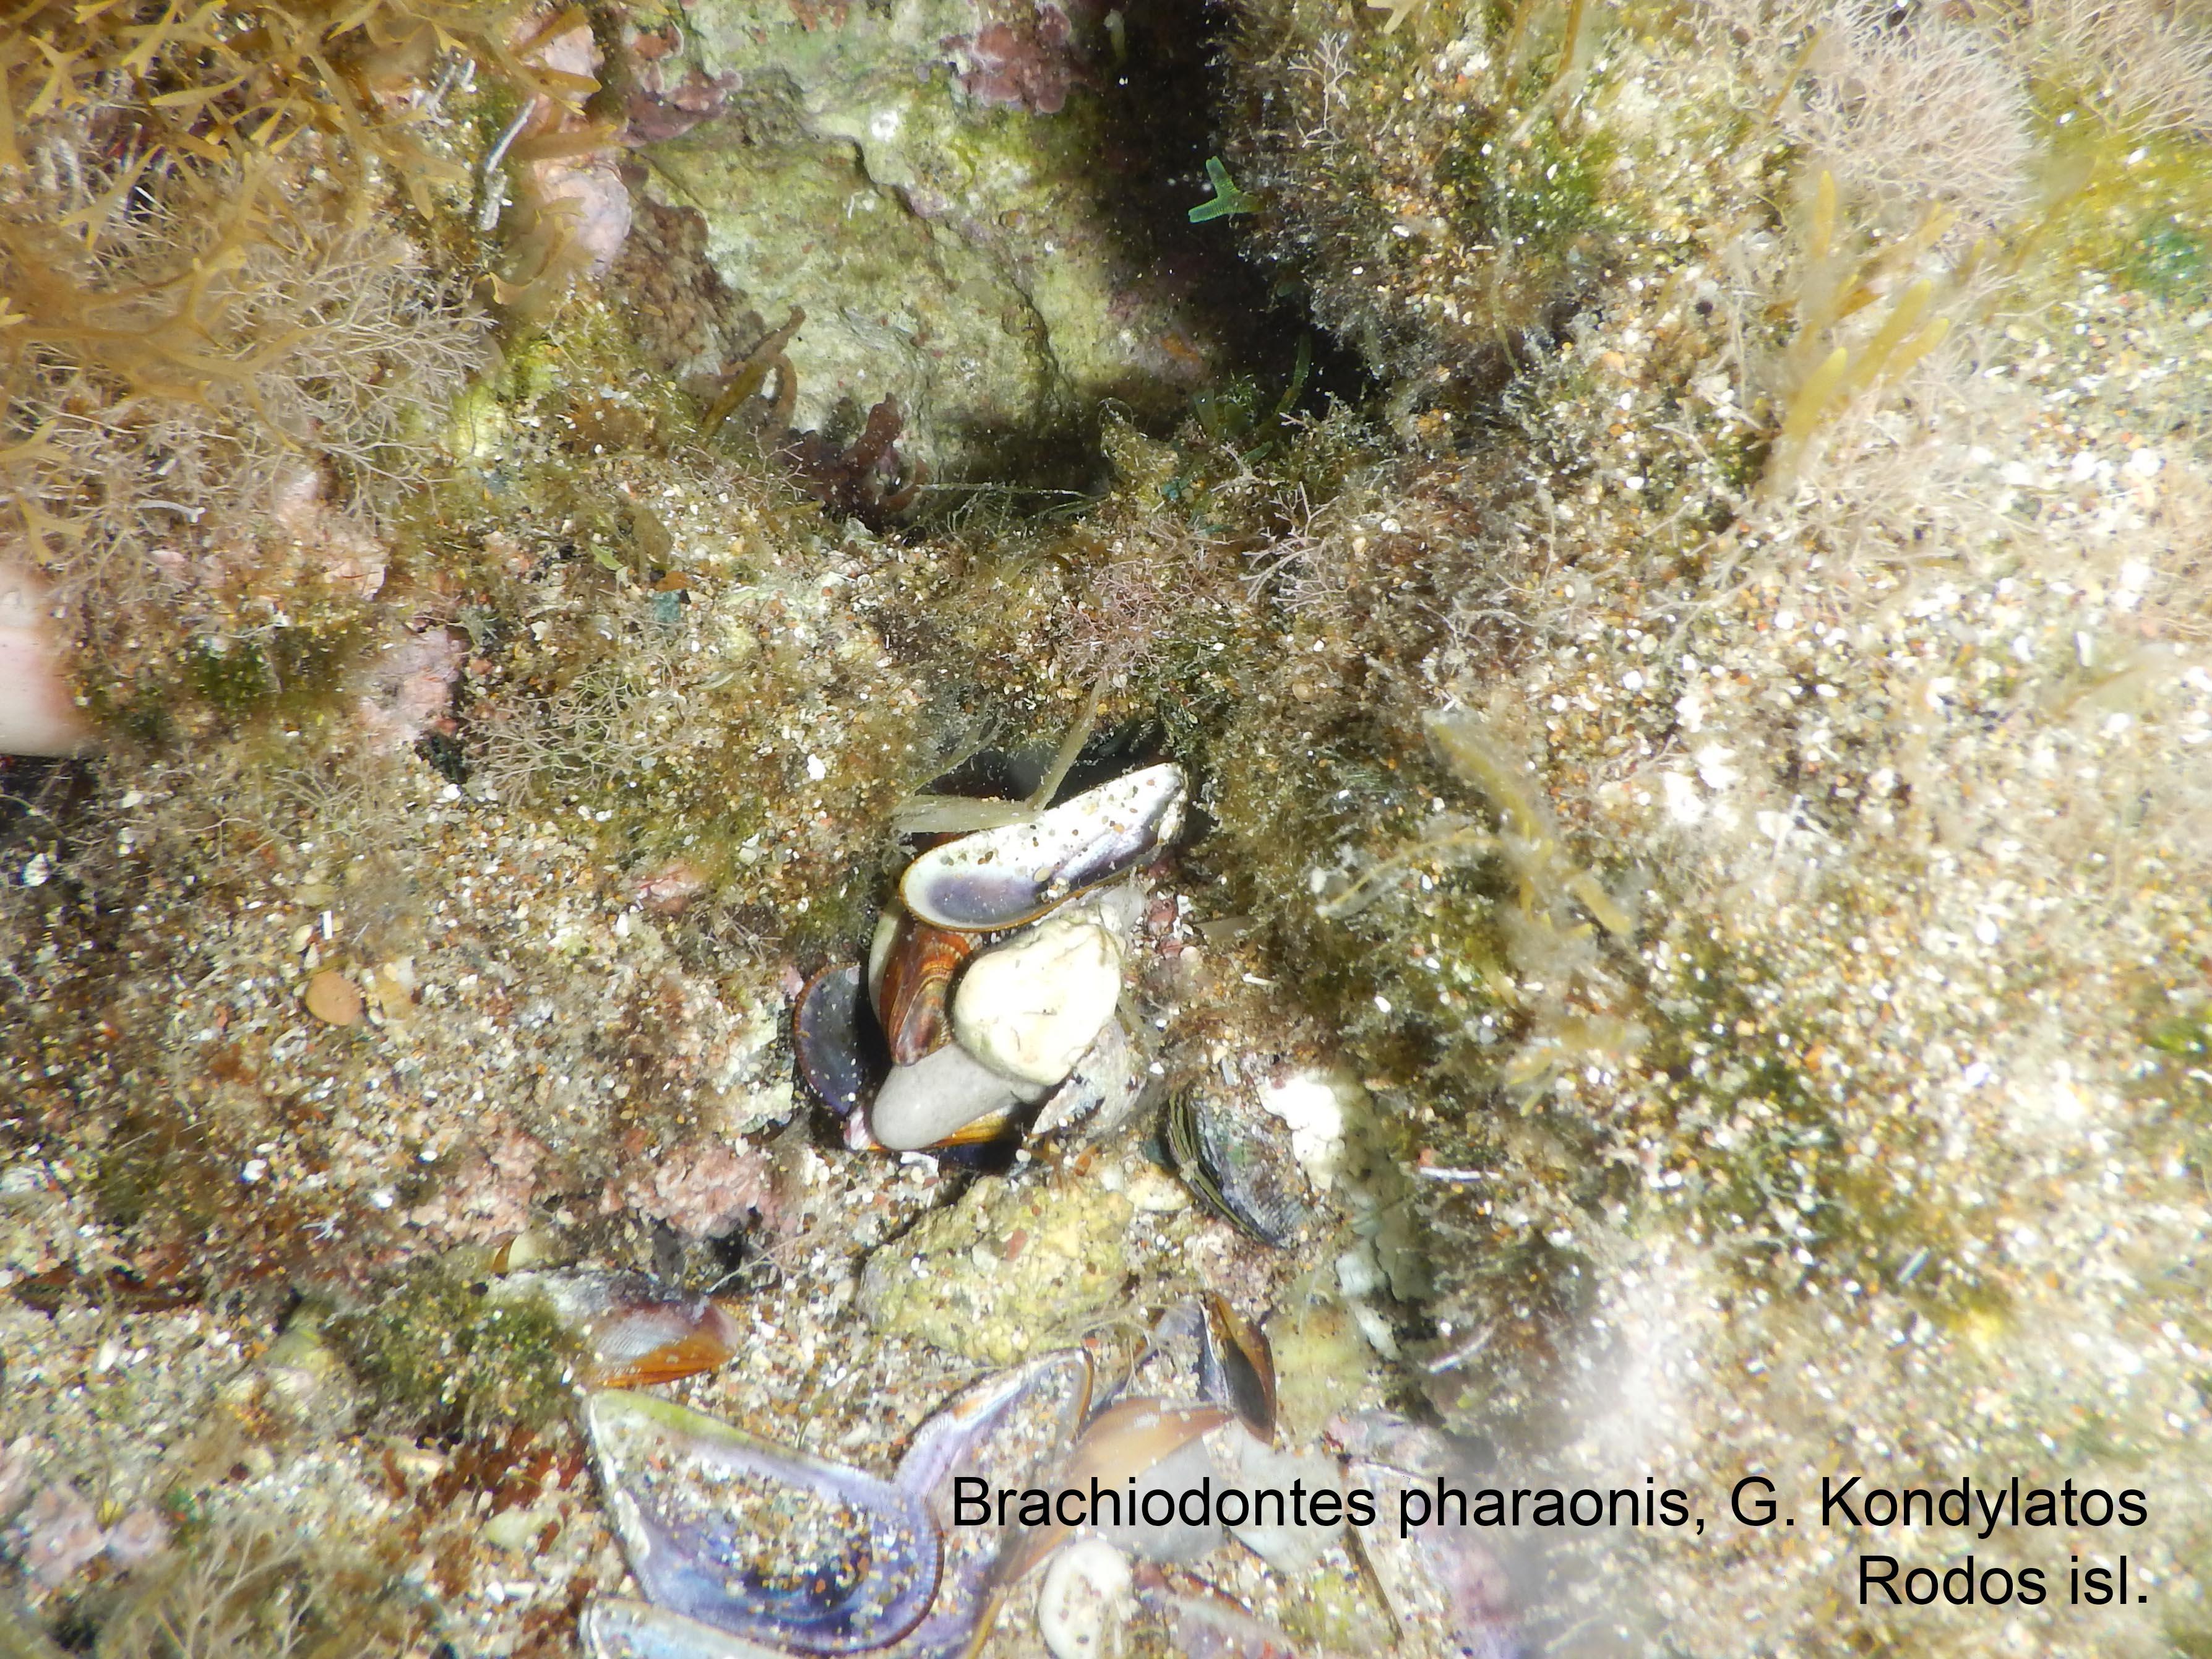 Brachidontes_pharaonis_Kondylatos_Rodos_2017